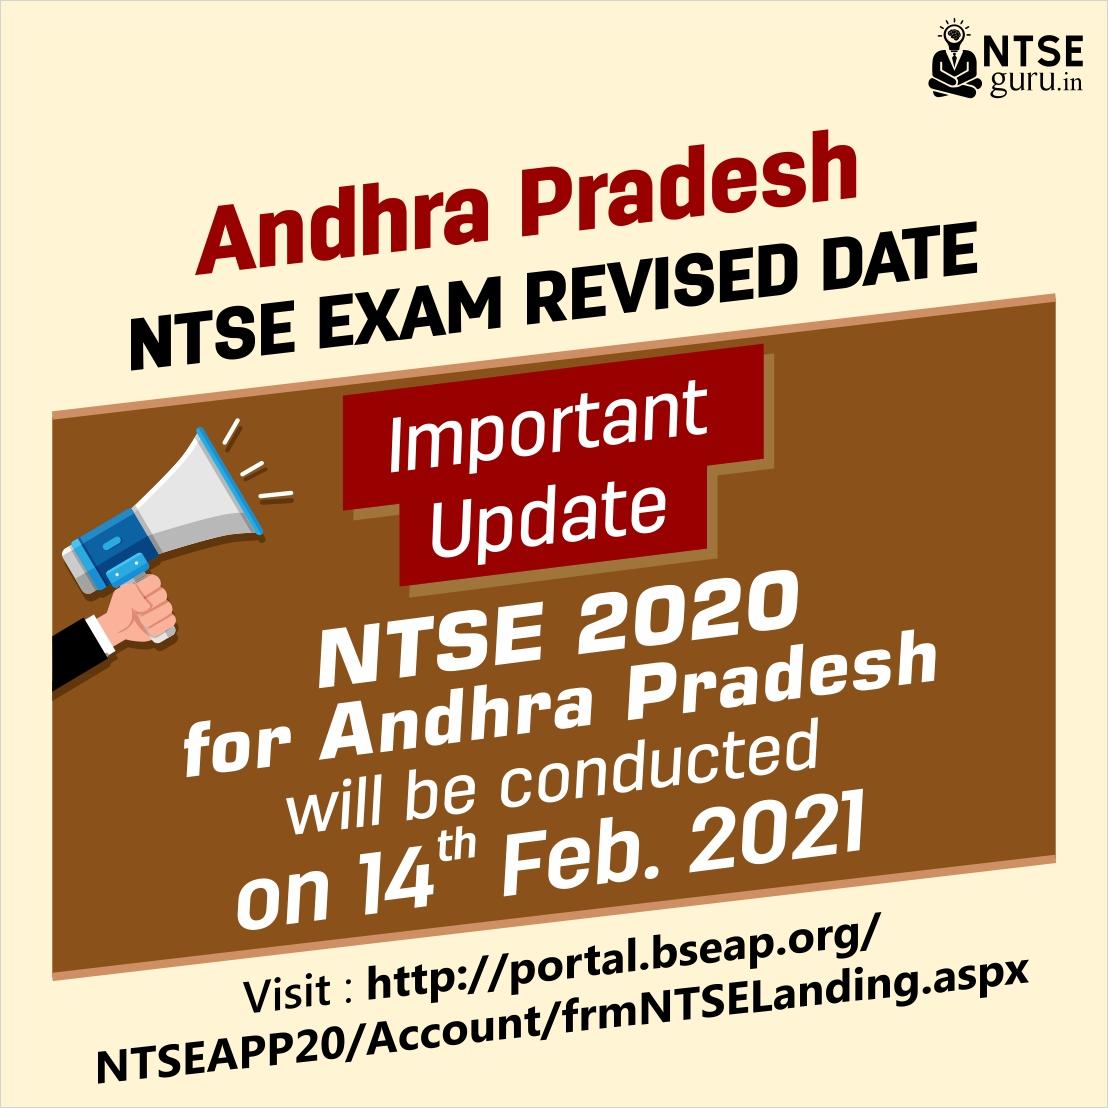 Andhra Pradesh NTSE Exam Date